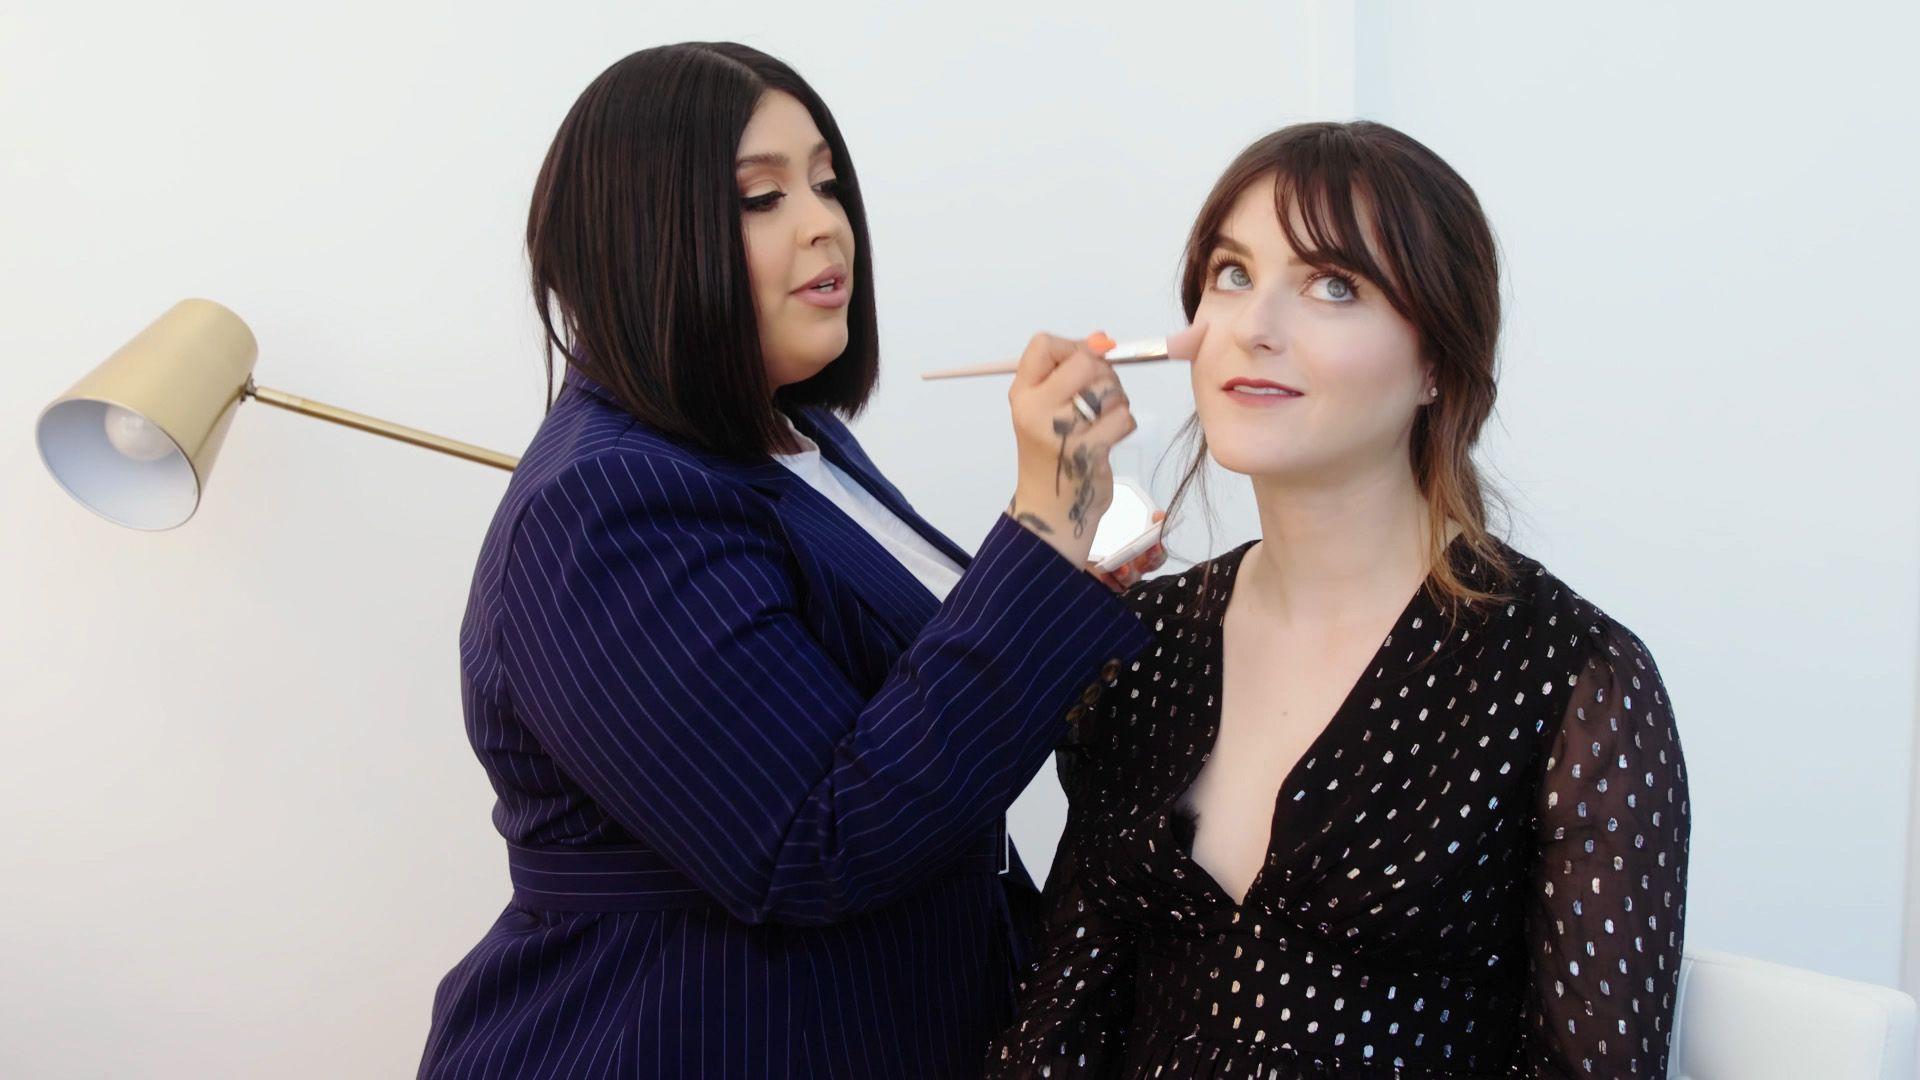 Fenty Beauty's Makeup Artist Priscilla Ono Has An Insane Beauty Collection